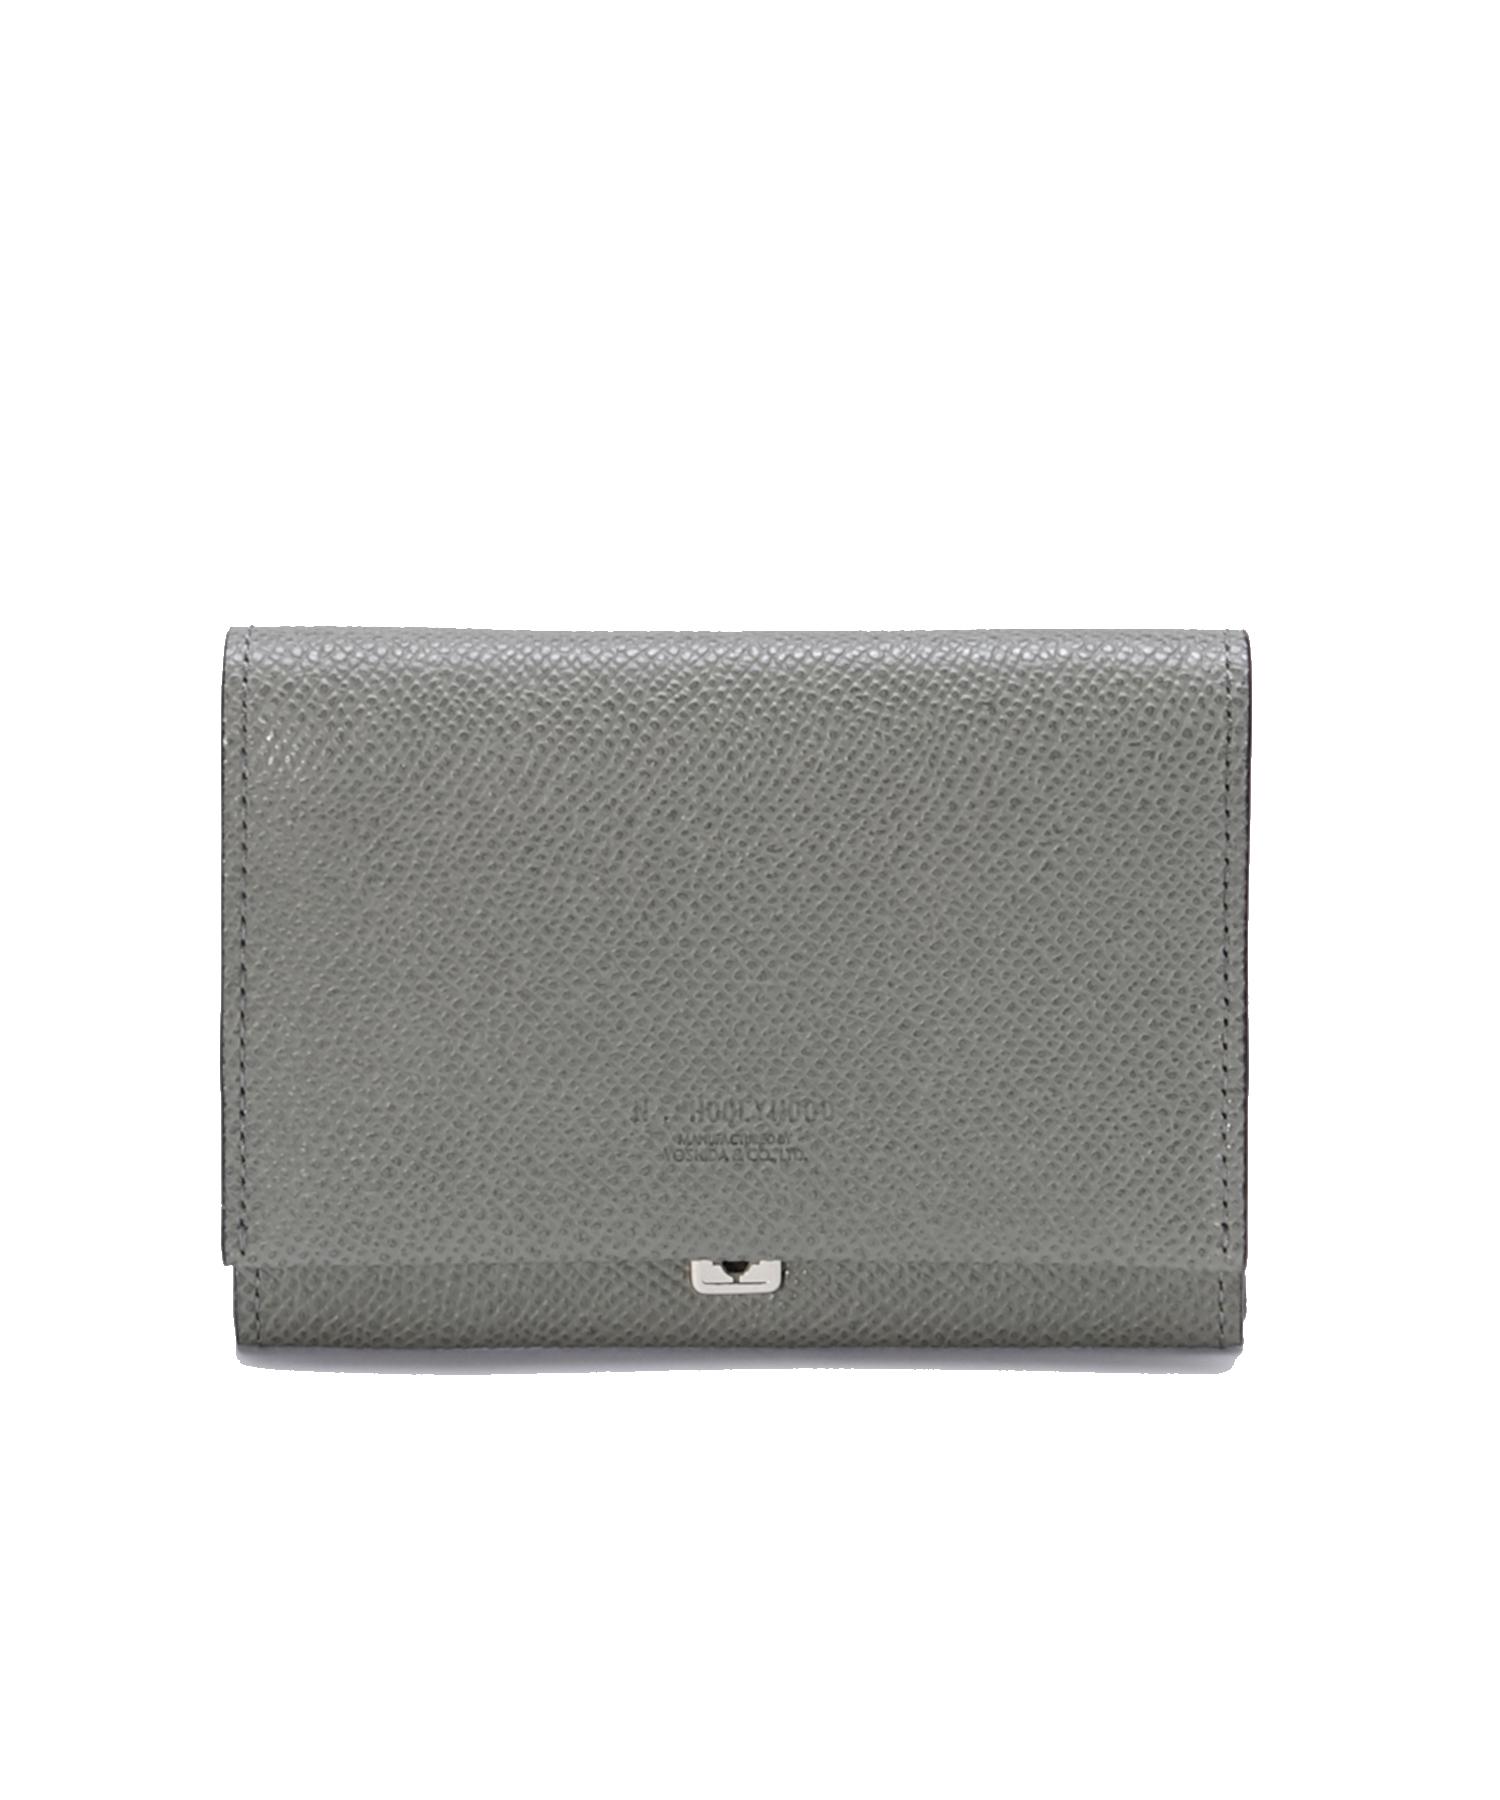 BUSINESS CARD HOLDER 【N.HOOLYWOOD COMPILE × PORTER】